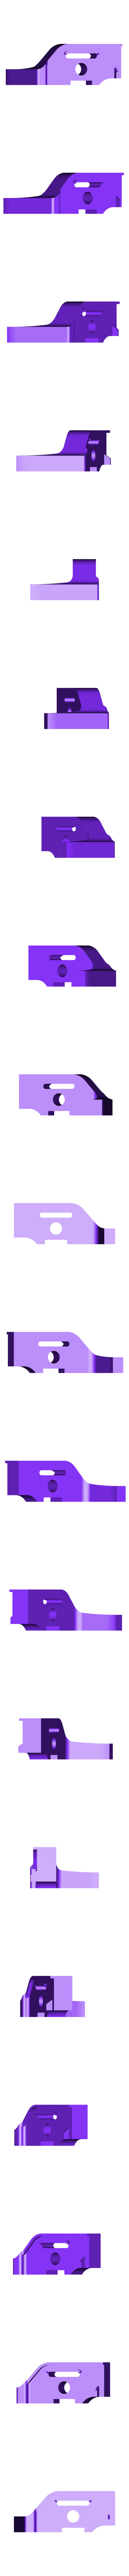 Trailing_Truck_Frame-4.STL Download free STL file 4-8-8-4 Big Boy Locomotive • 3D printer object, RaymondDeLuca